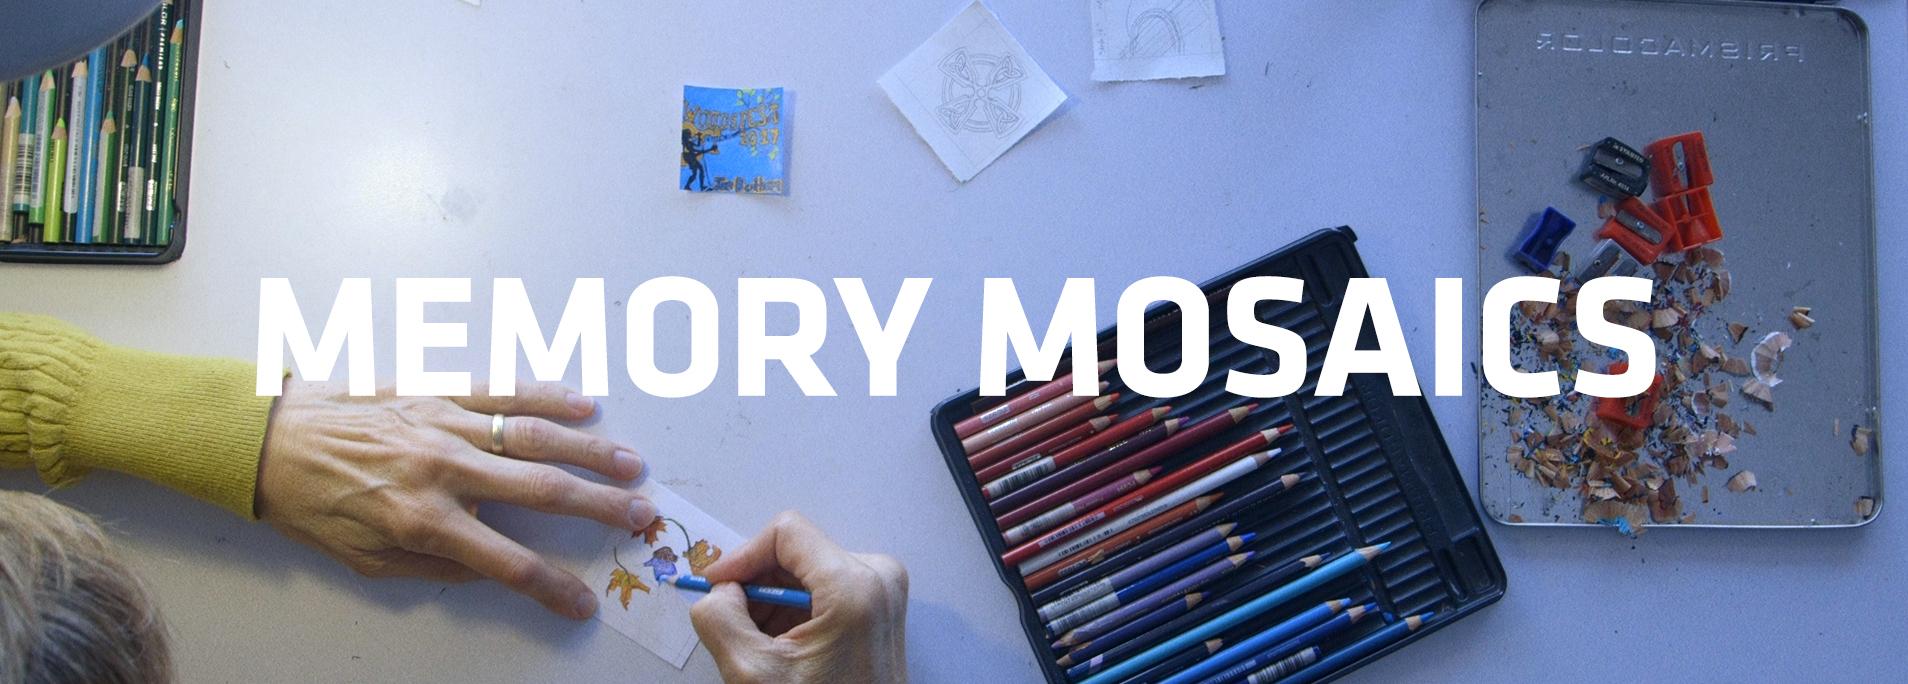 MemoryMosaics_TItle.jpg